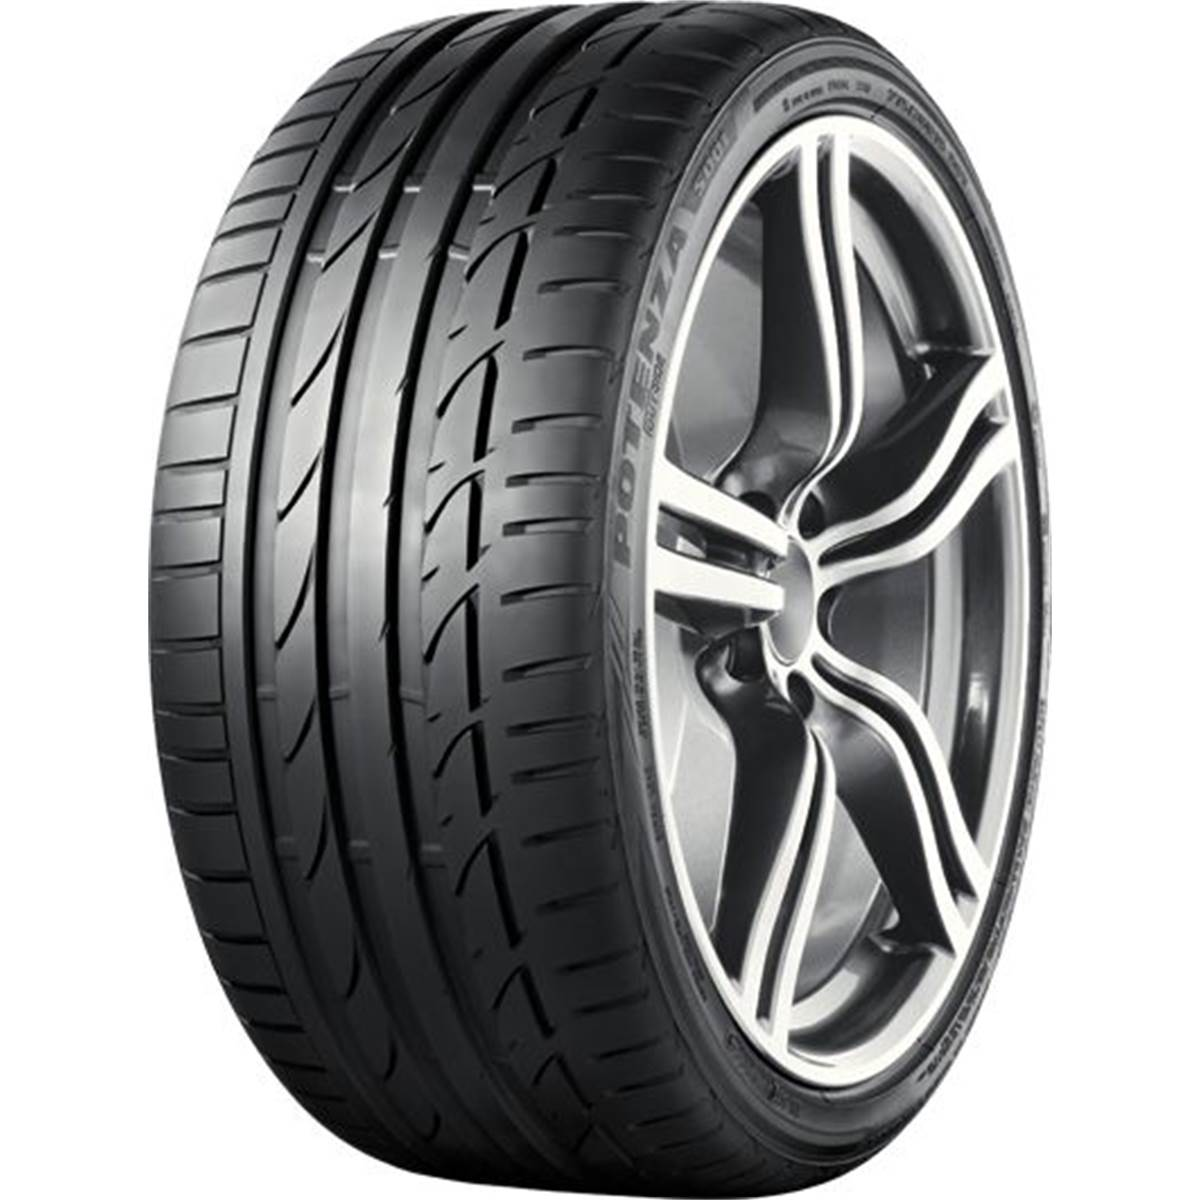 Pneu Bridgestone 225/45R17 91W Potenza S001